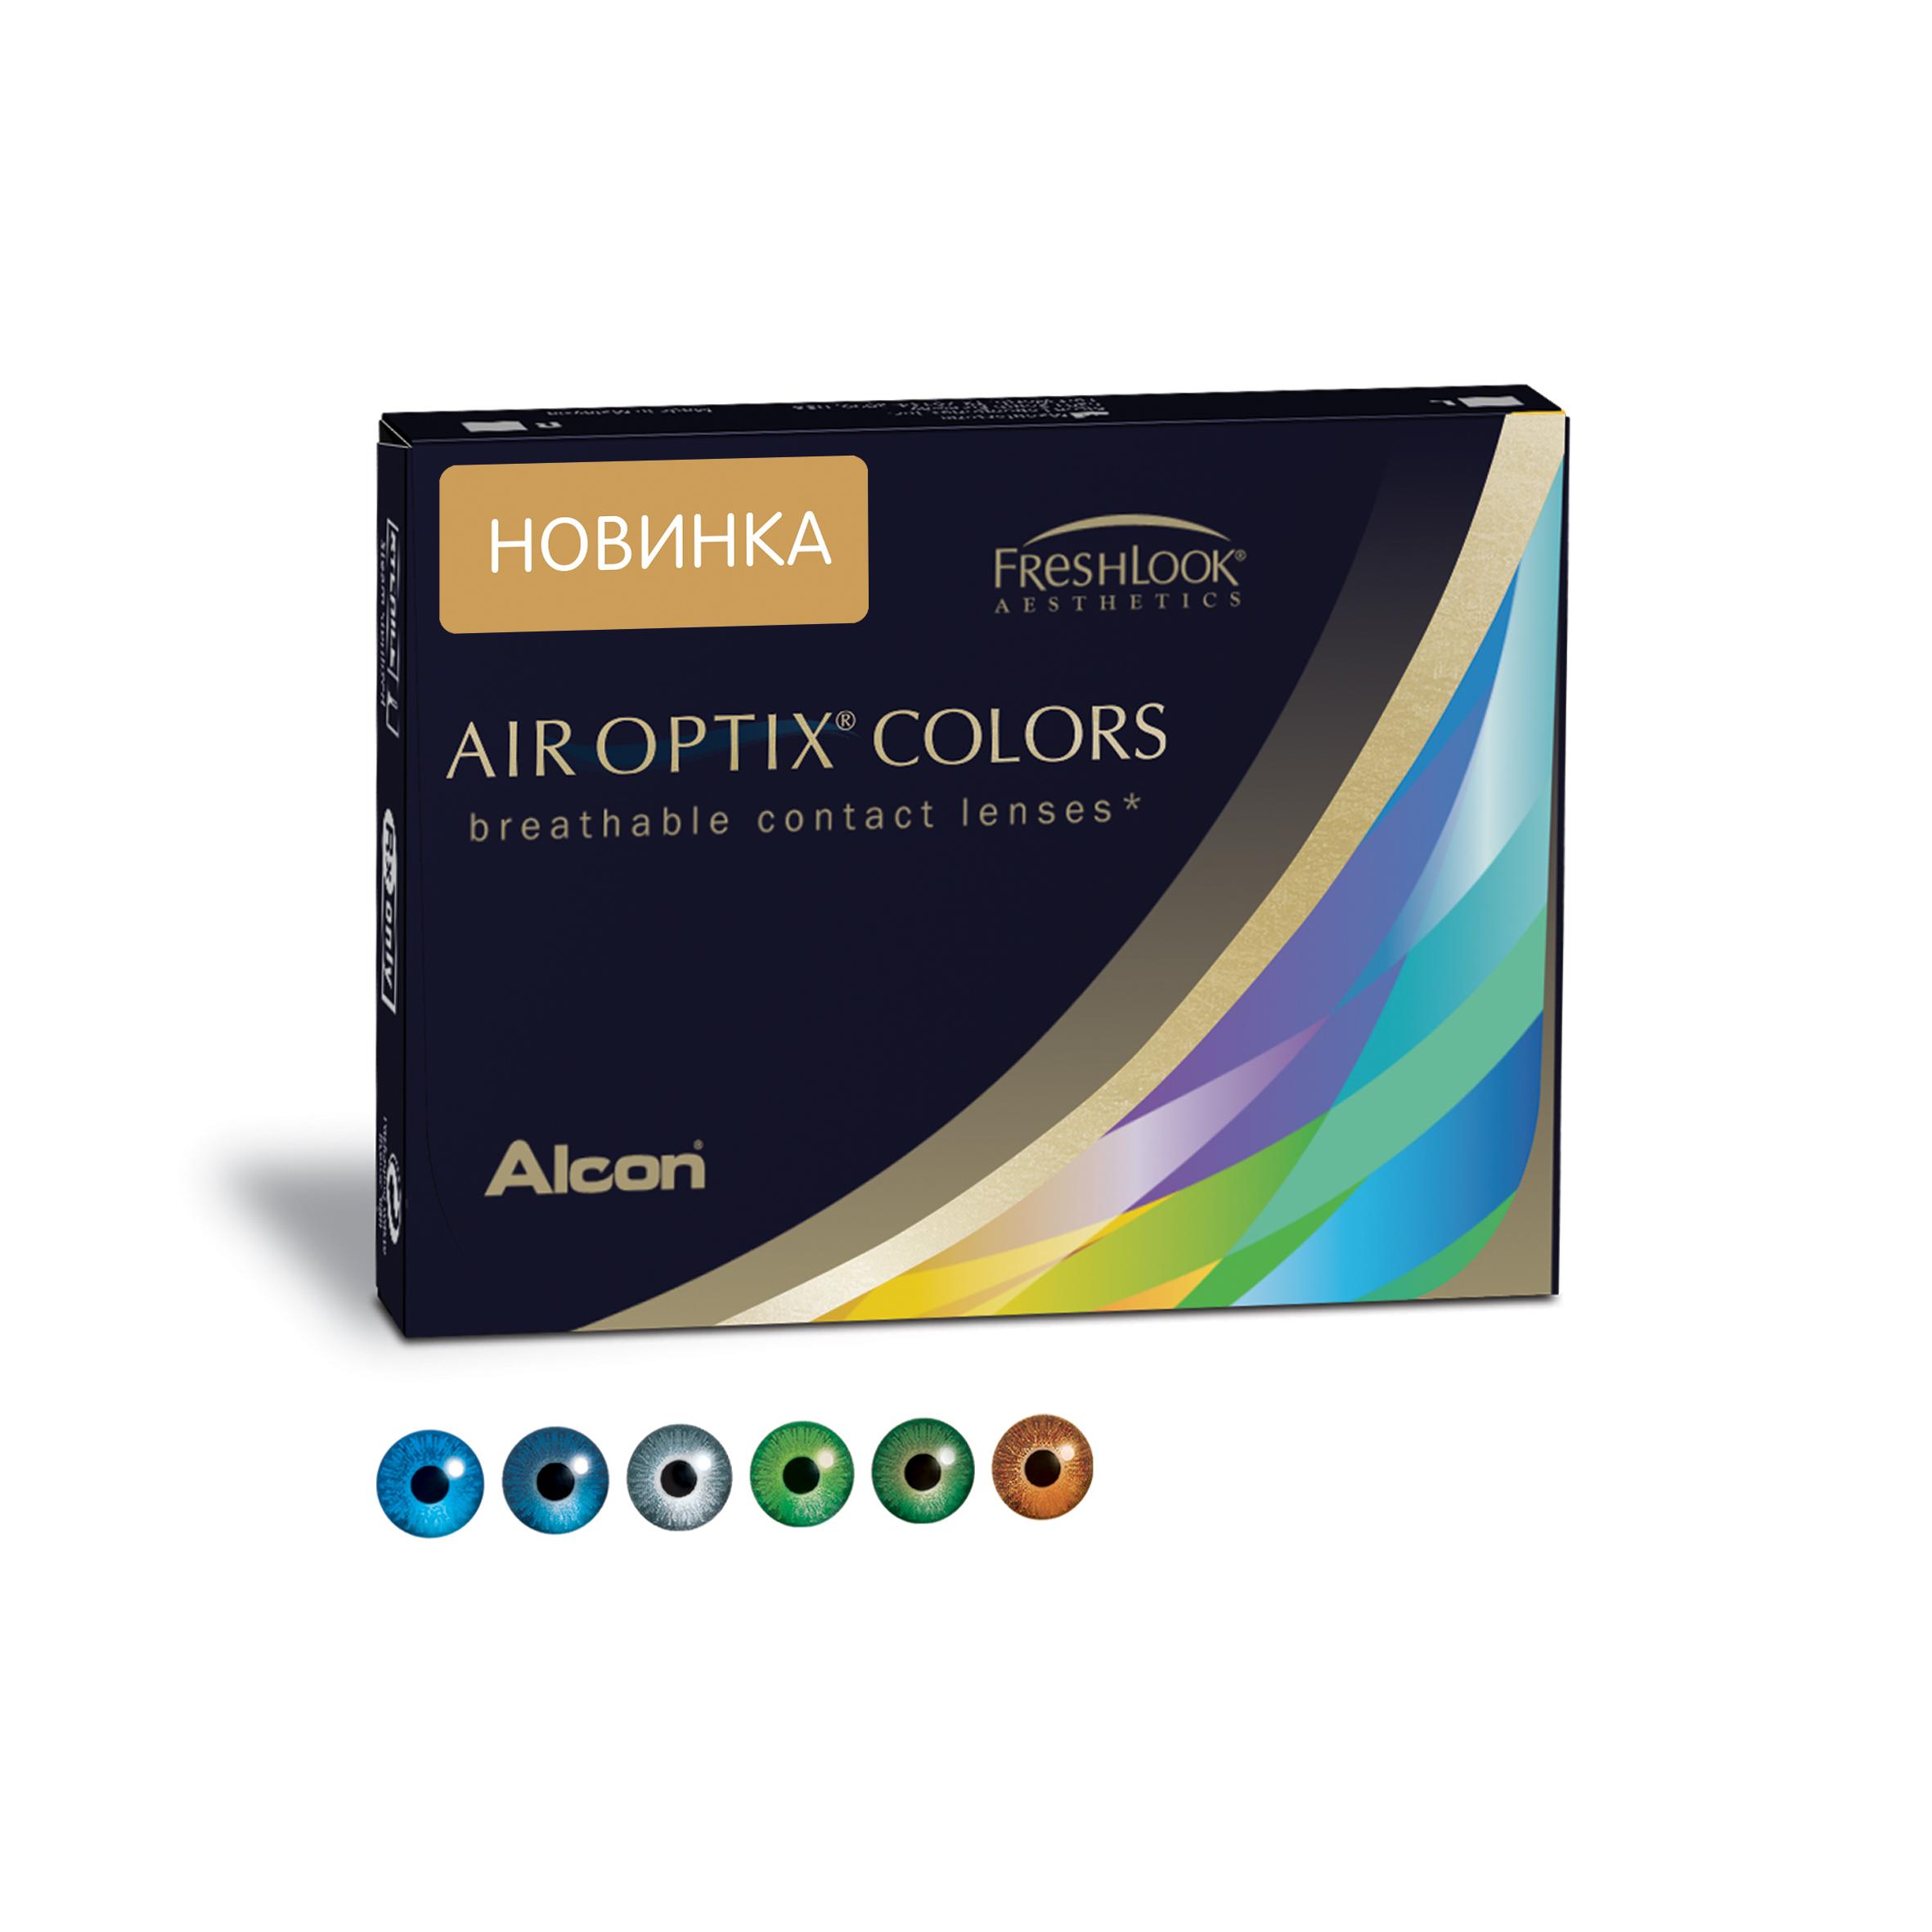 Аlcon контактные линзы Air Optix Colors 2 шт -5.25 Brilliant Blue